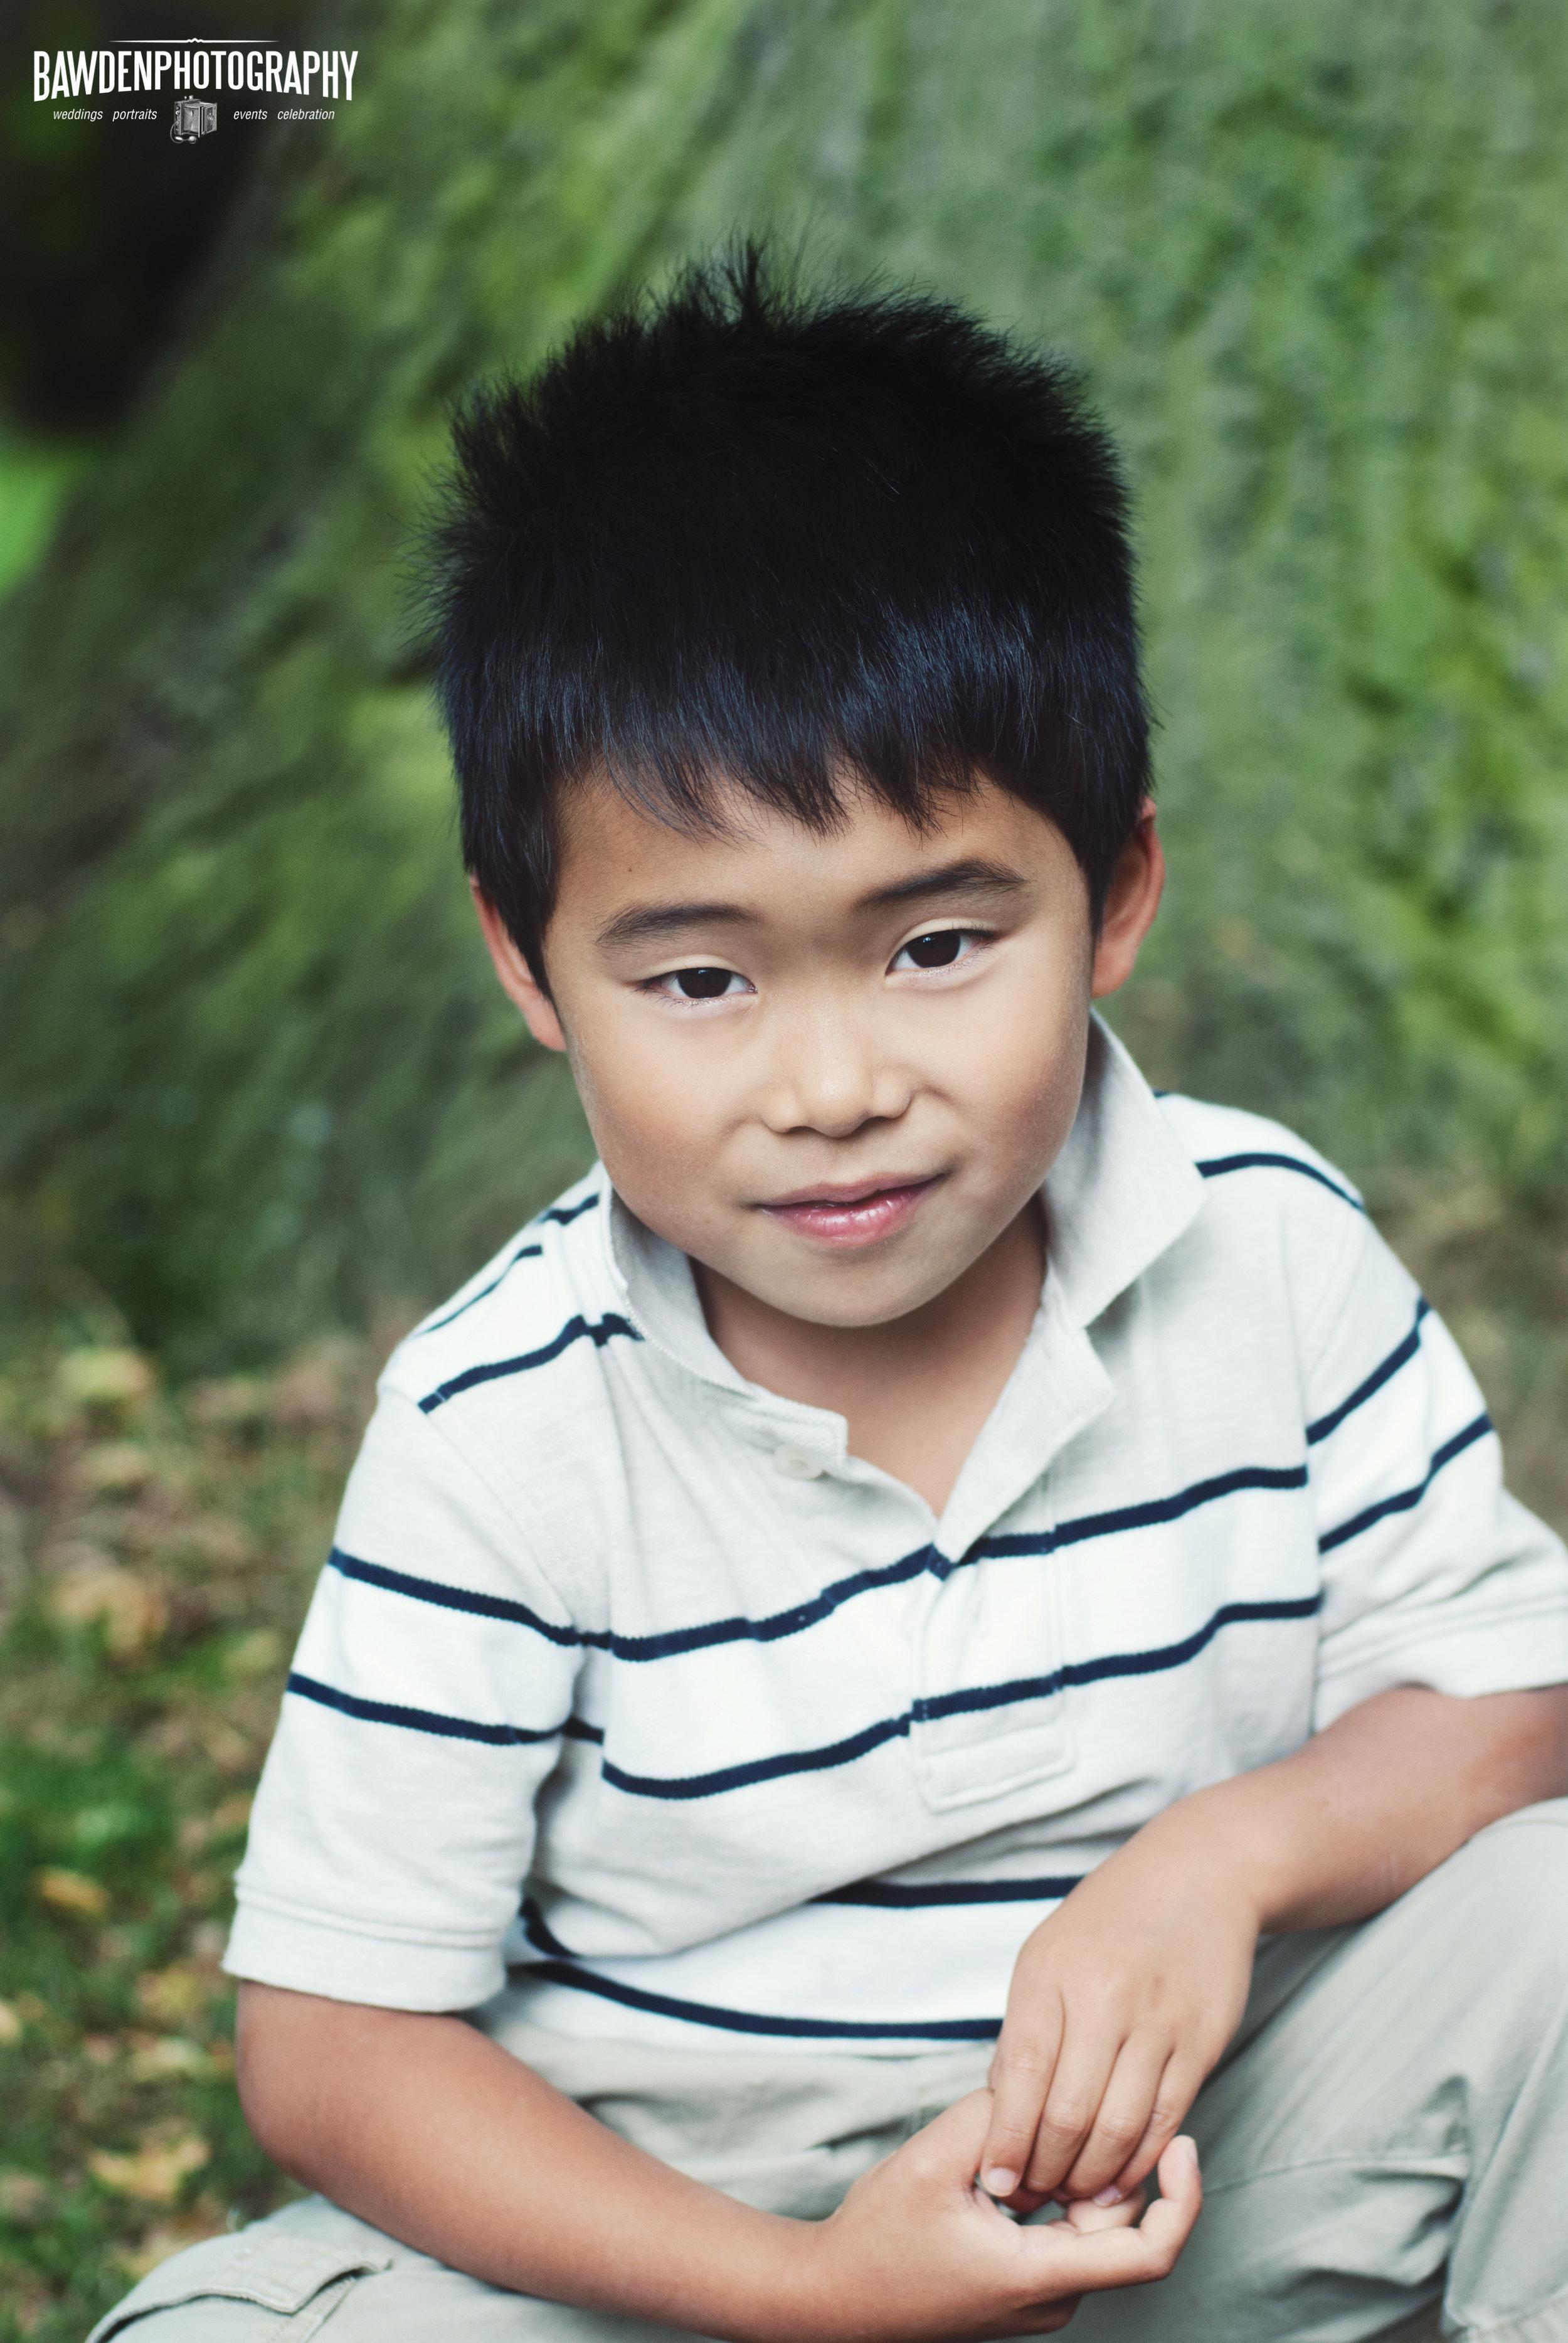 Children Portrait Photography UK